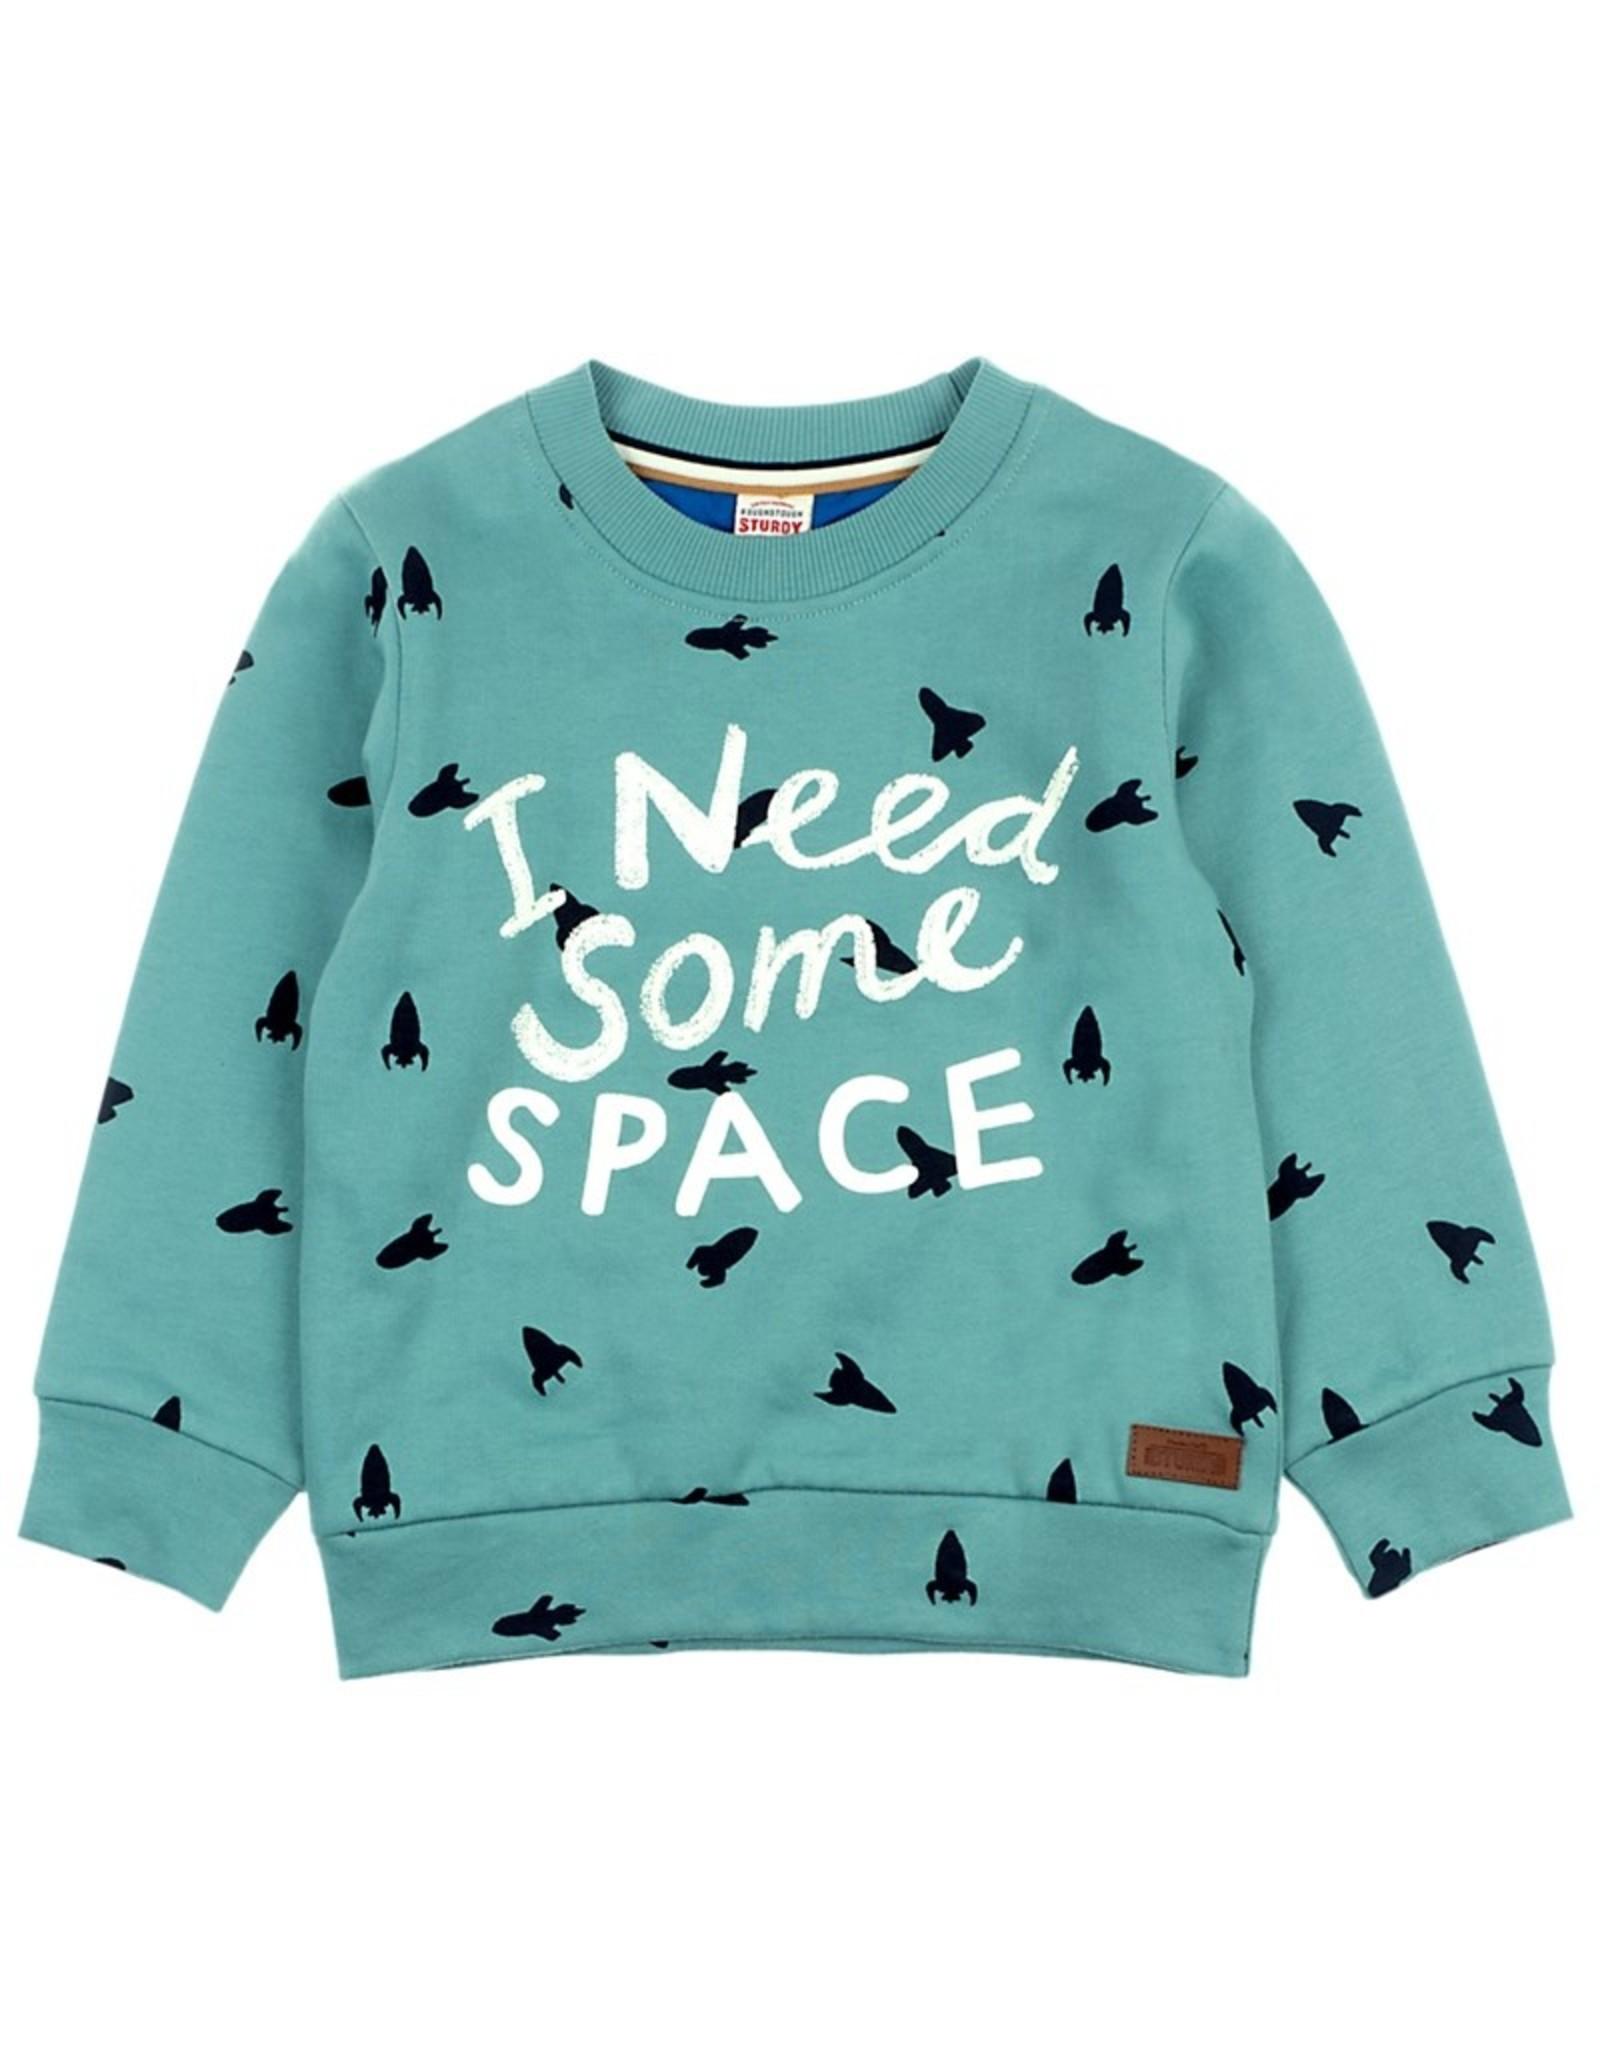 Sturdy Sturdy trui met 'I Need Some Space' opdruk